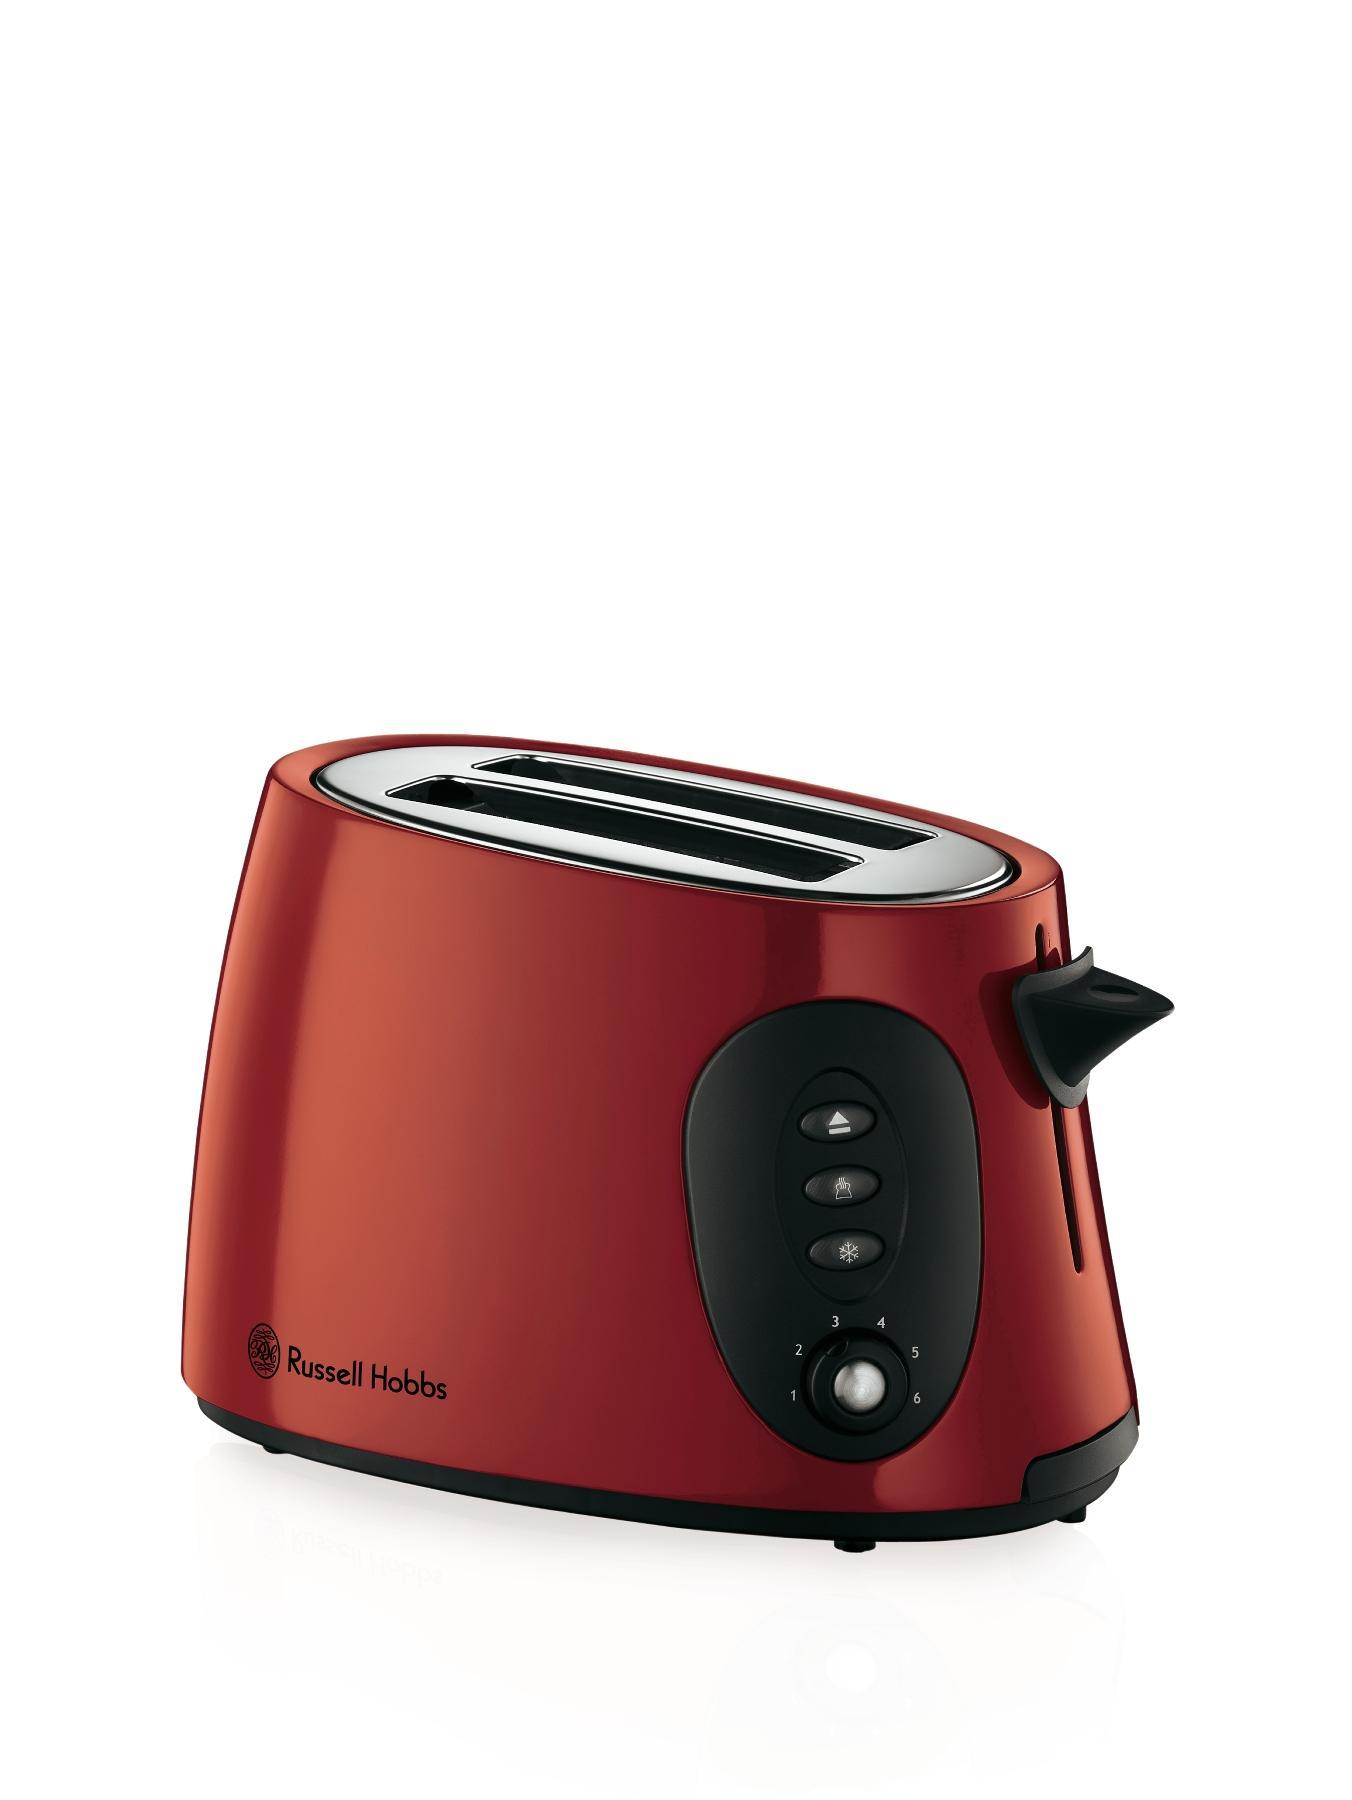 18580 Stylis 2-Slice Toaster